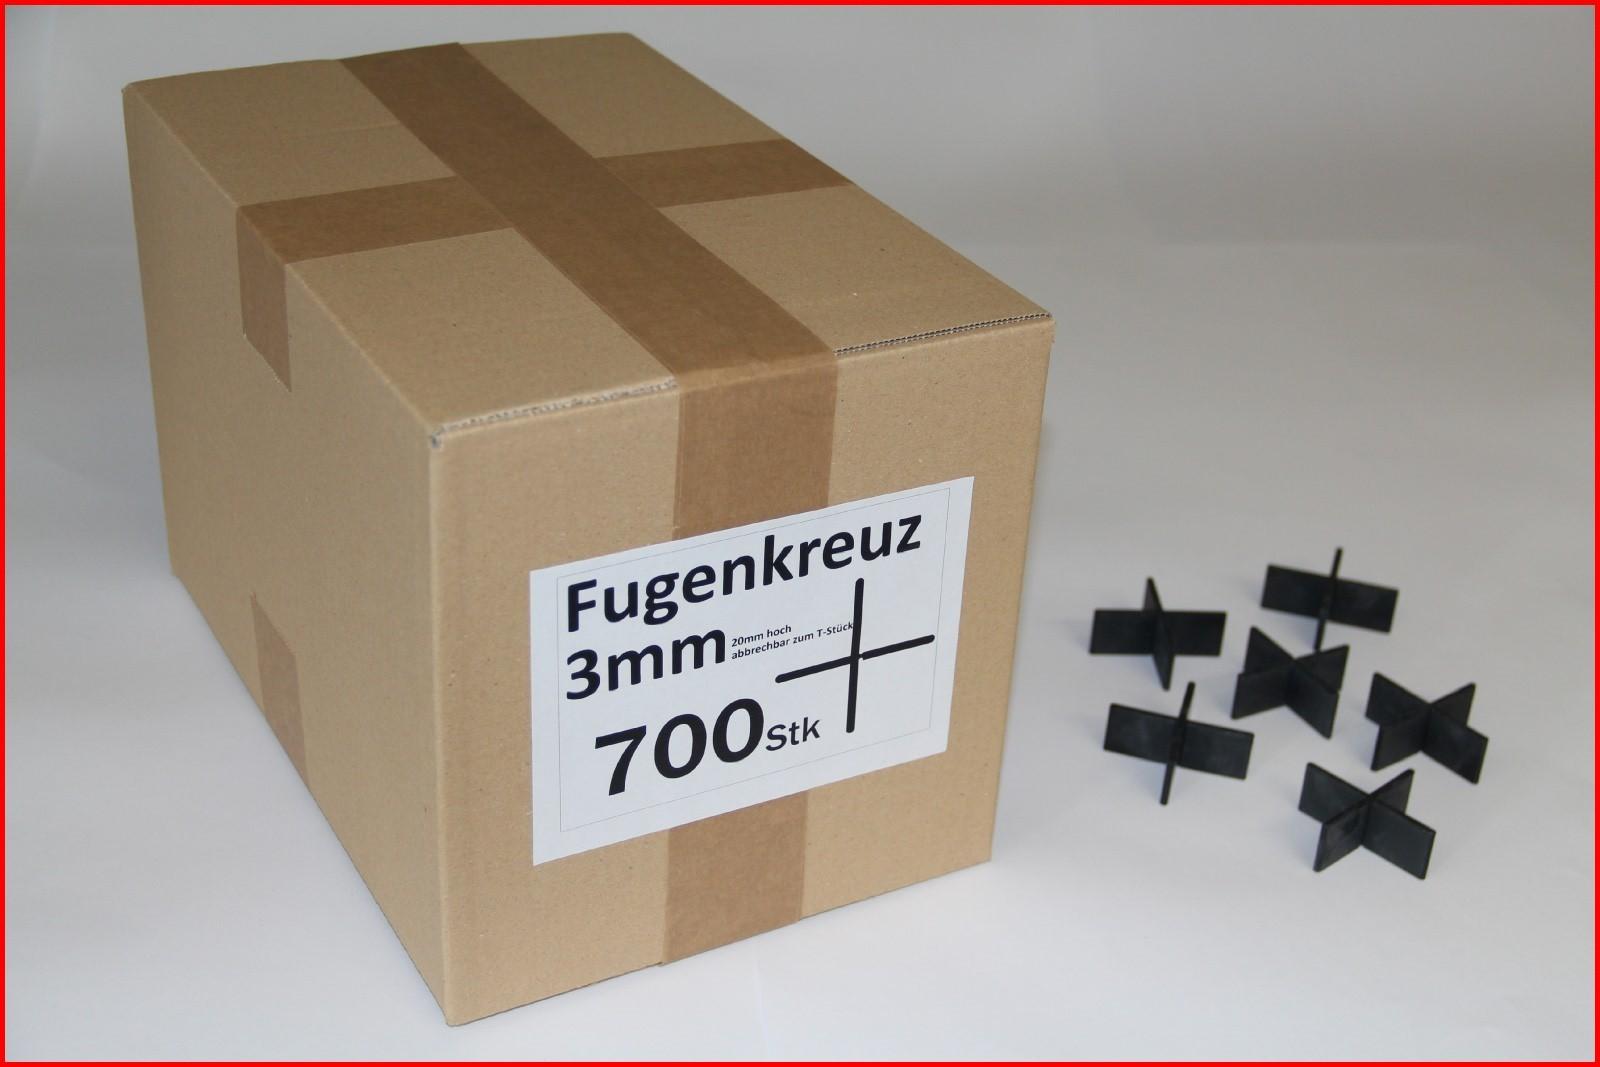 300 St/ück im Karton Fugenkreuze 3mm Bauh/öhe 20mm